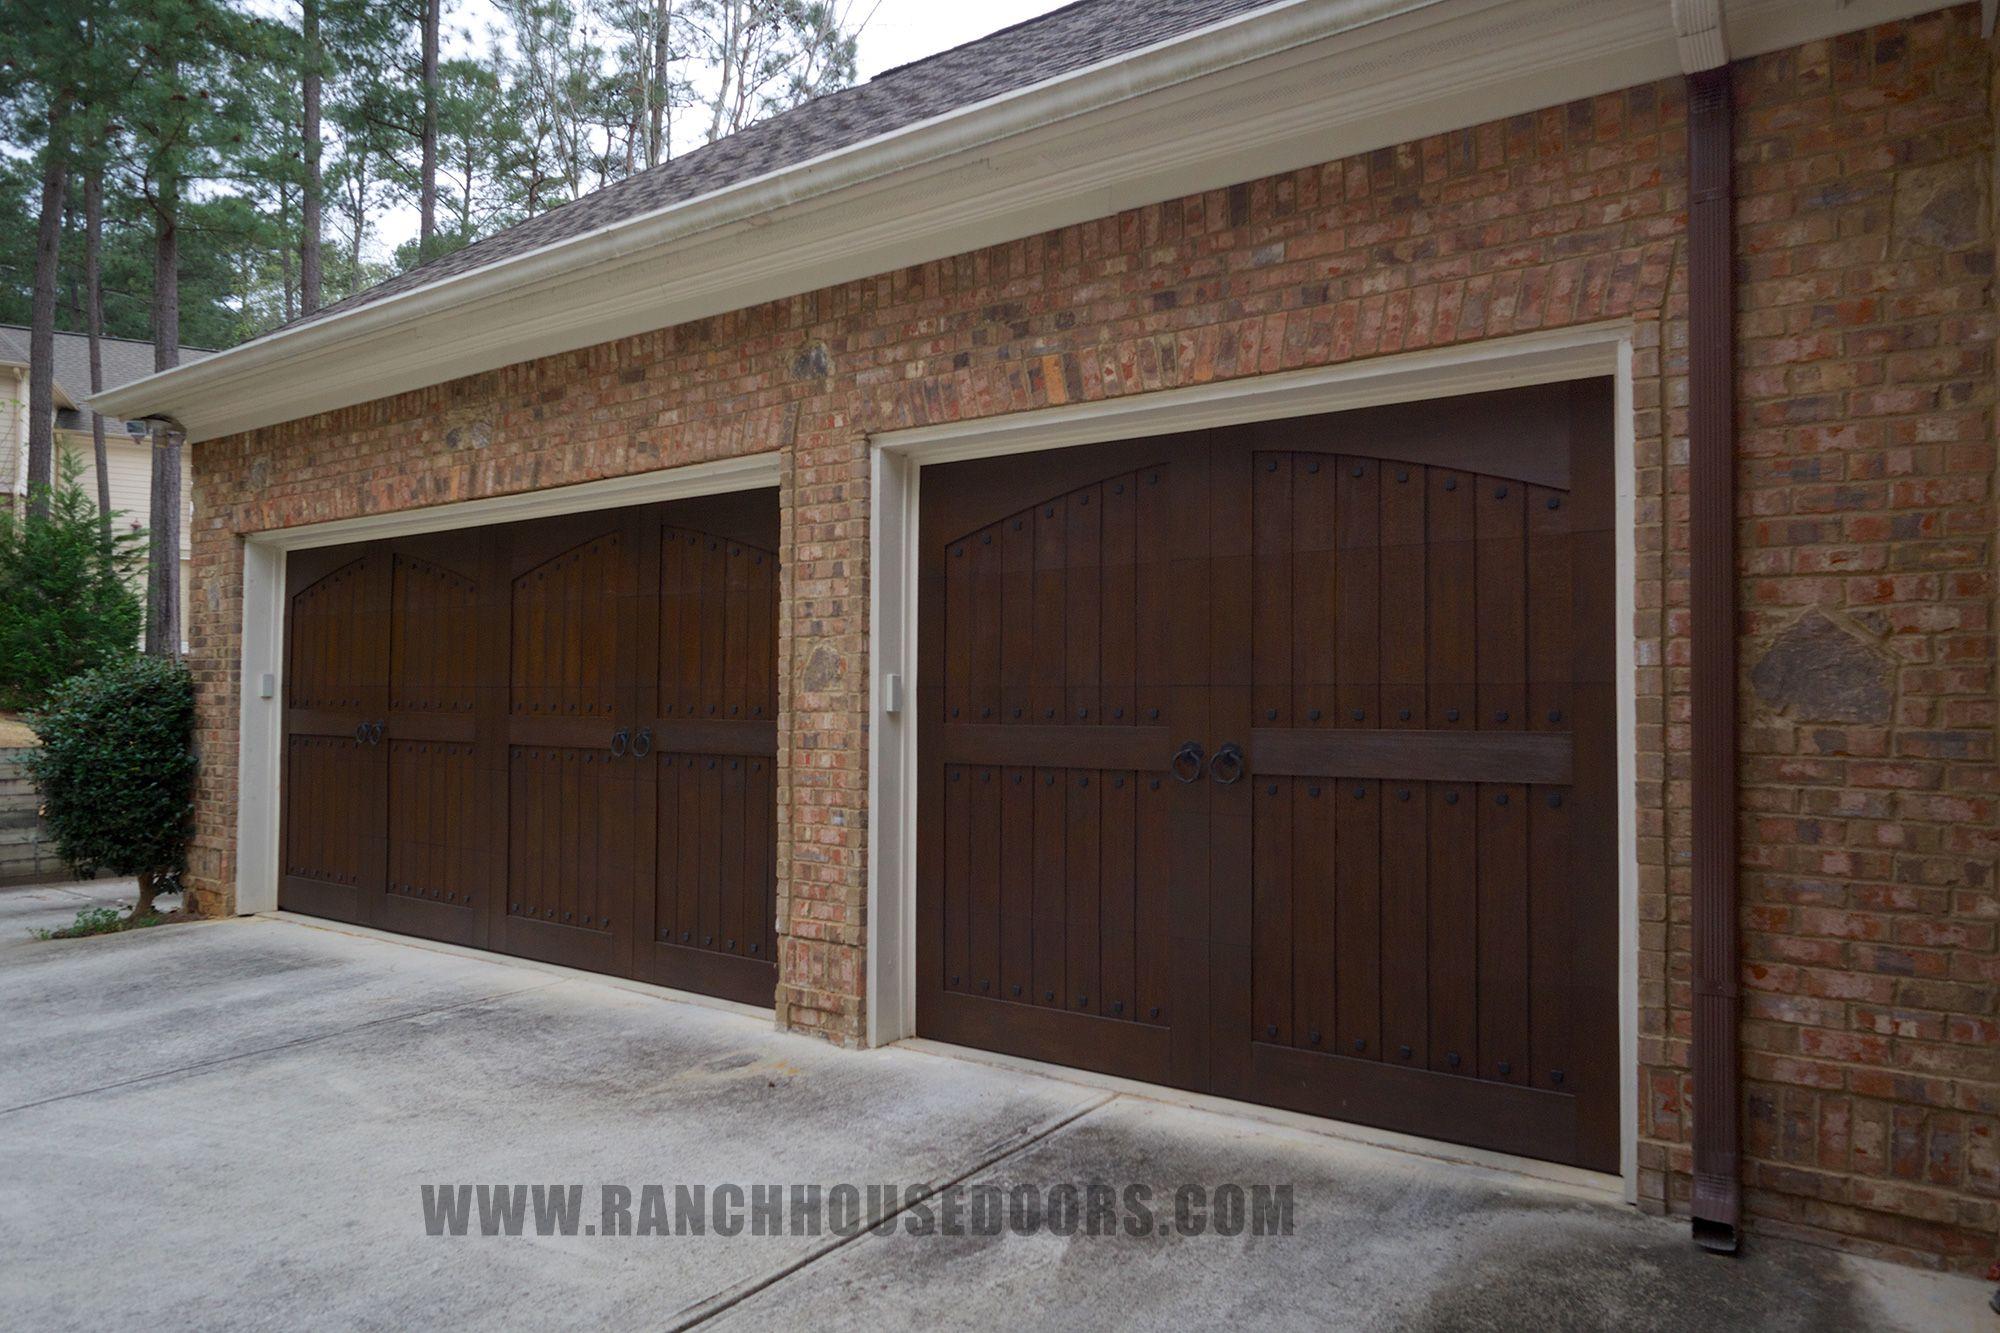 Ranch House Doors Elements Collection Faux Wood Garage Doors